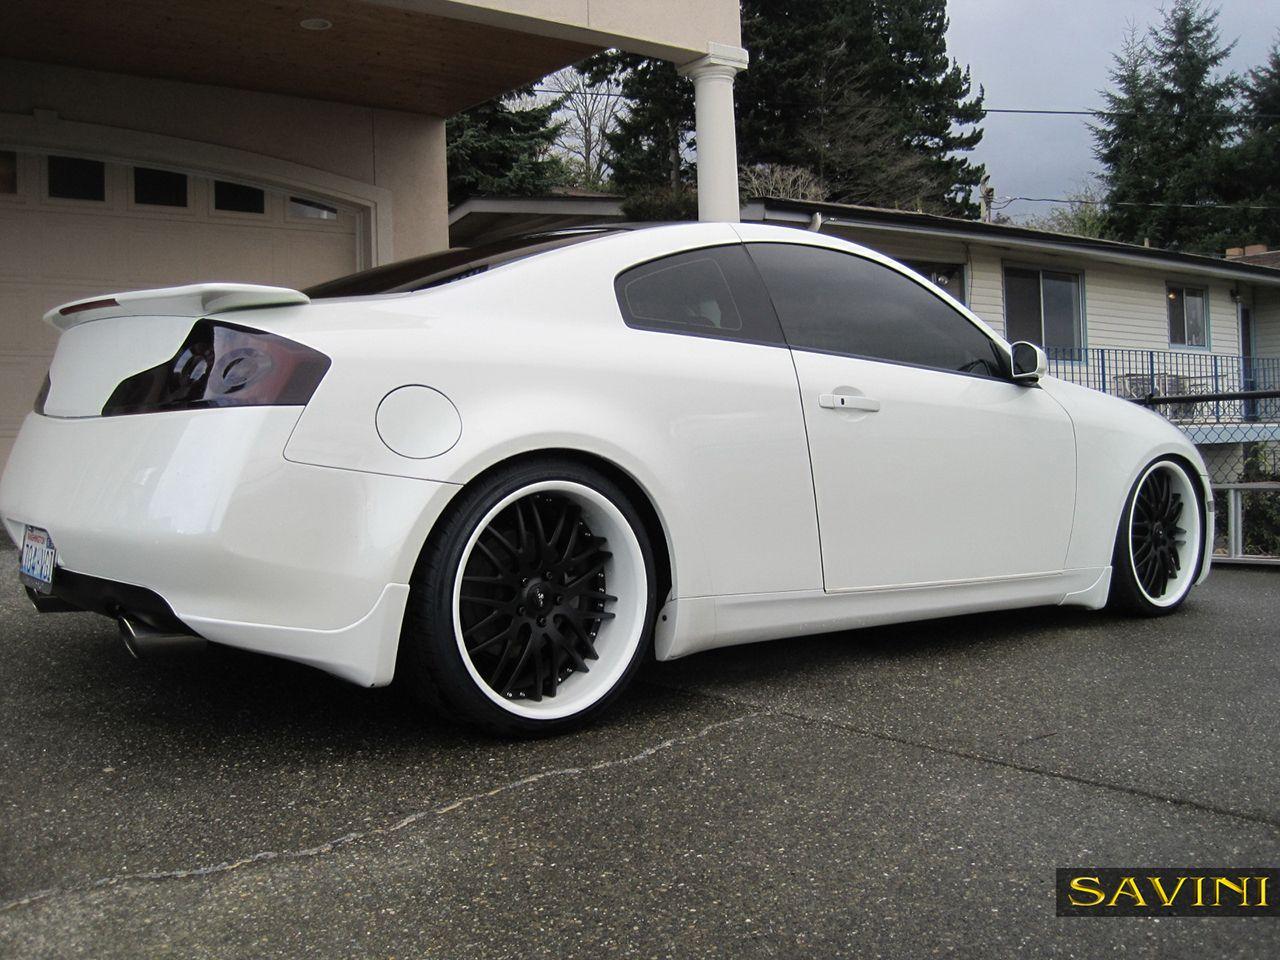 infiniti g37 white with black rims. white infiniti g37 coupe black rims google search with c